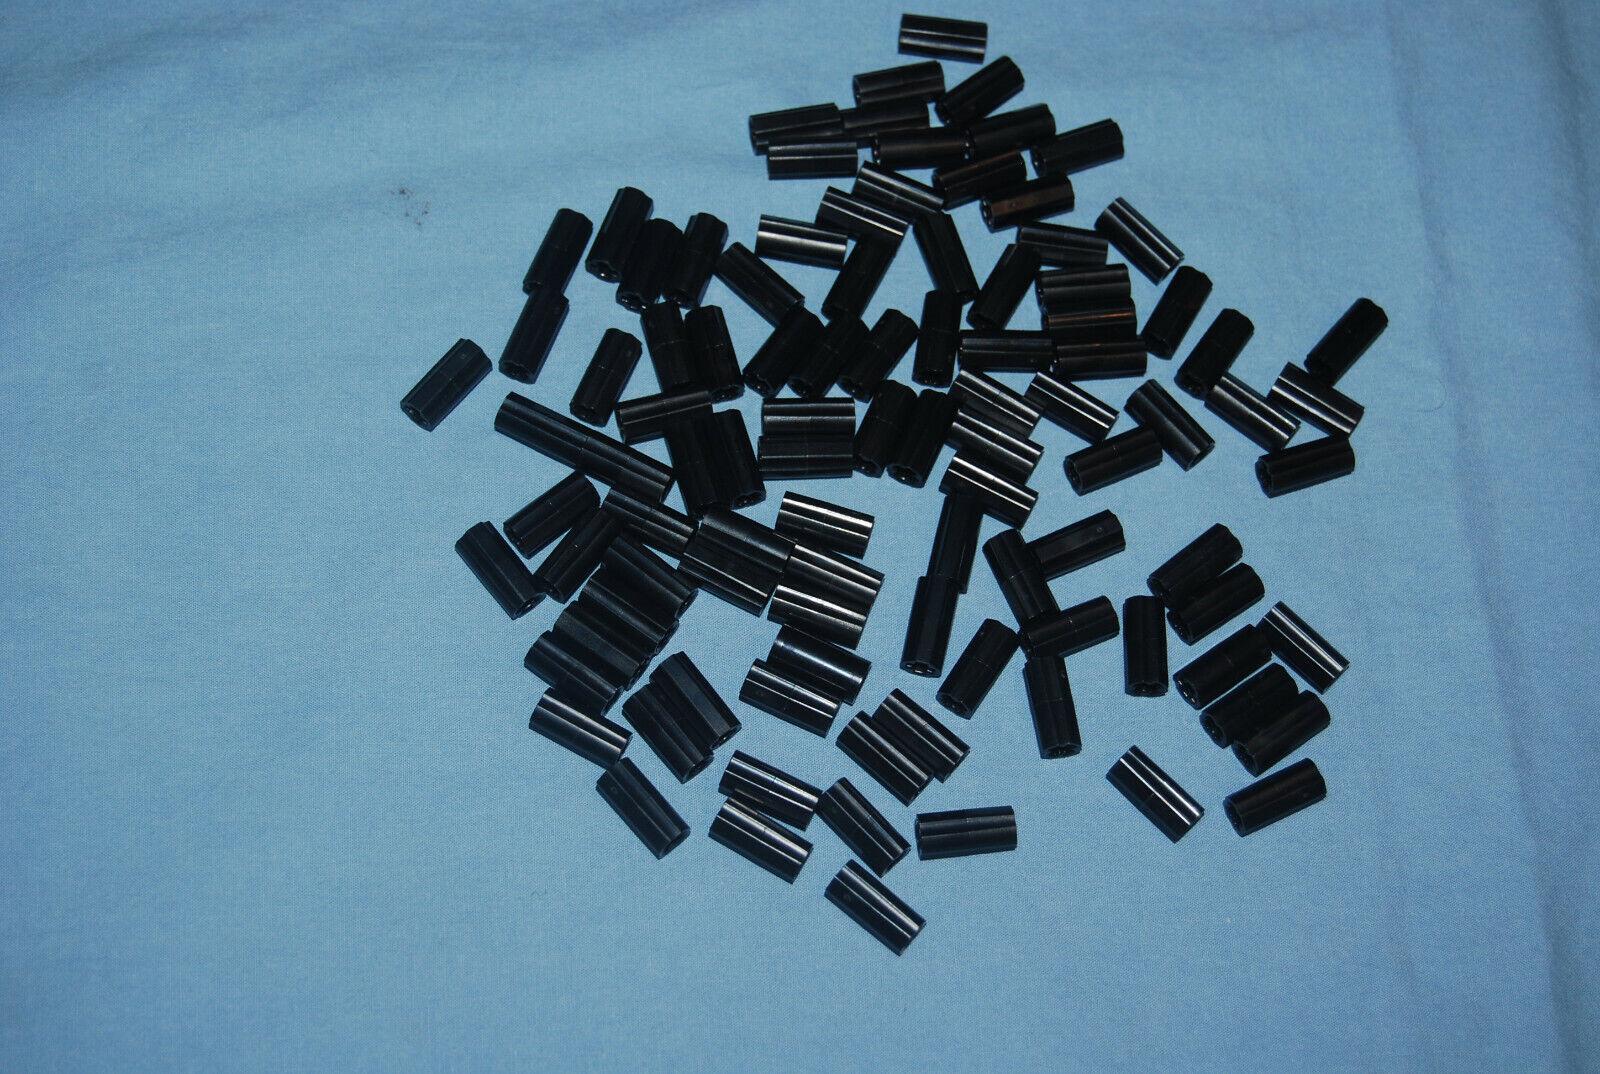 Plate Modified w// Stud 1 x 2 ~ Part# 3794 DARK BLUE 2 LEGO Parts Pieces Lot ~